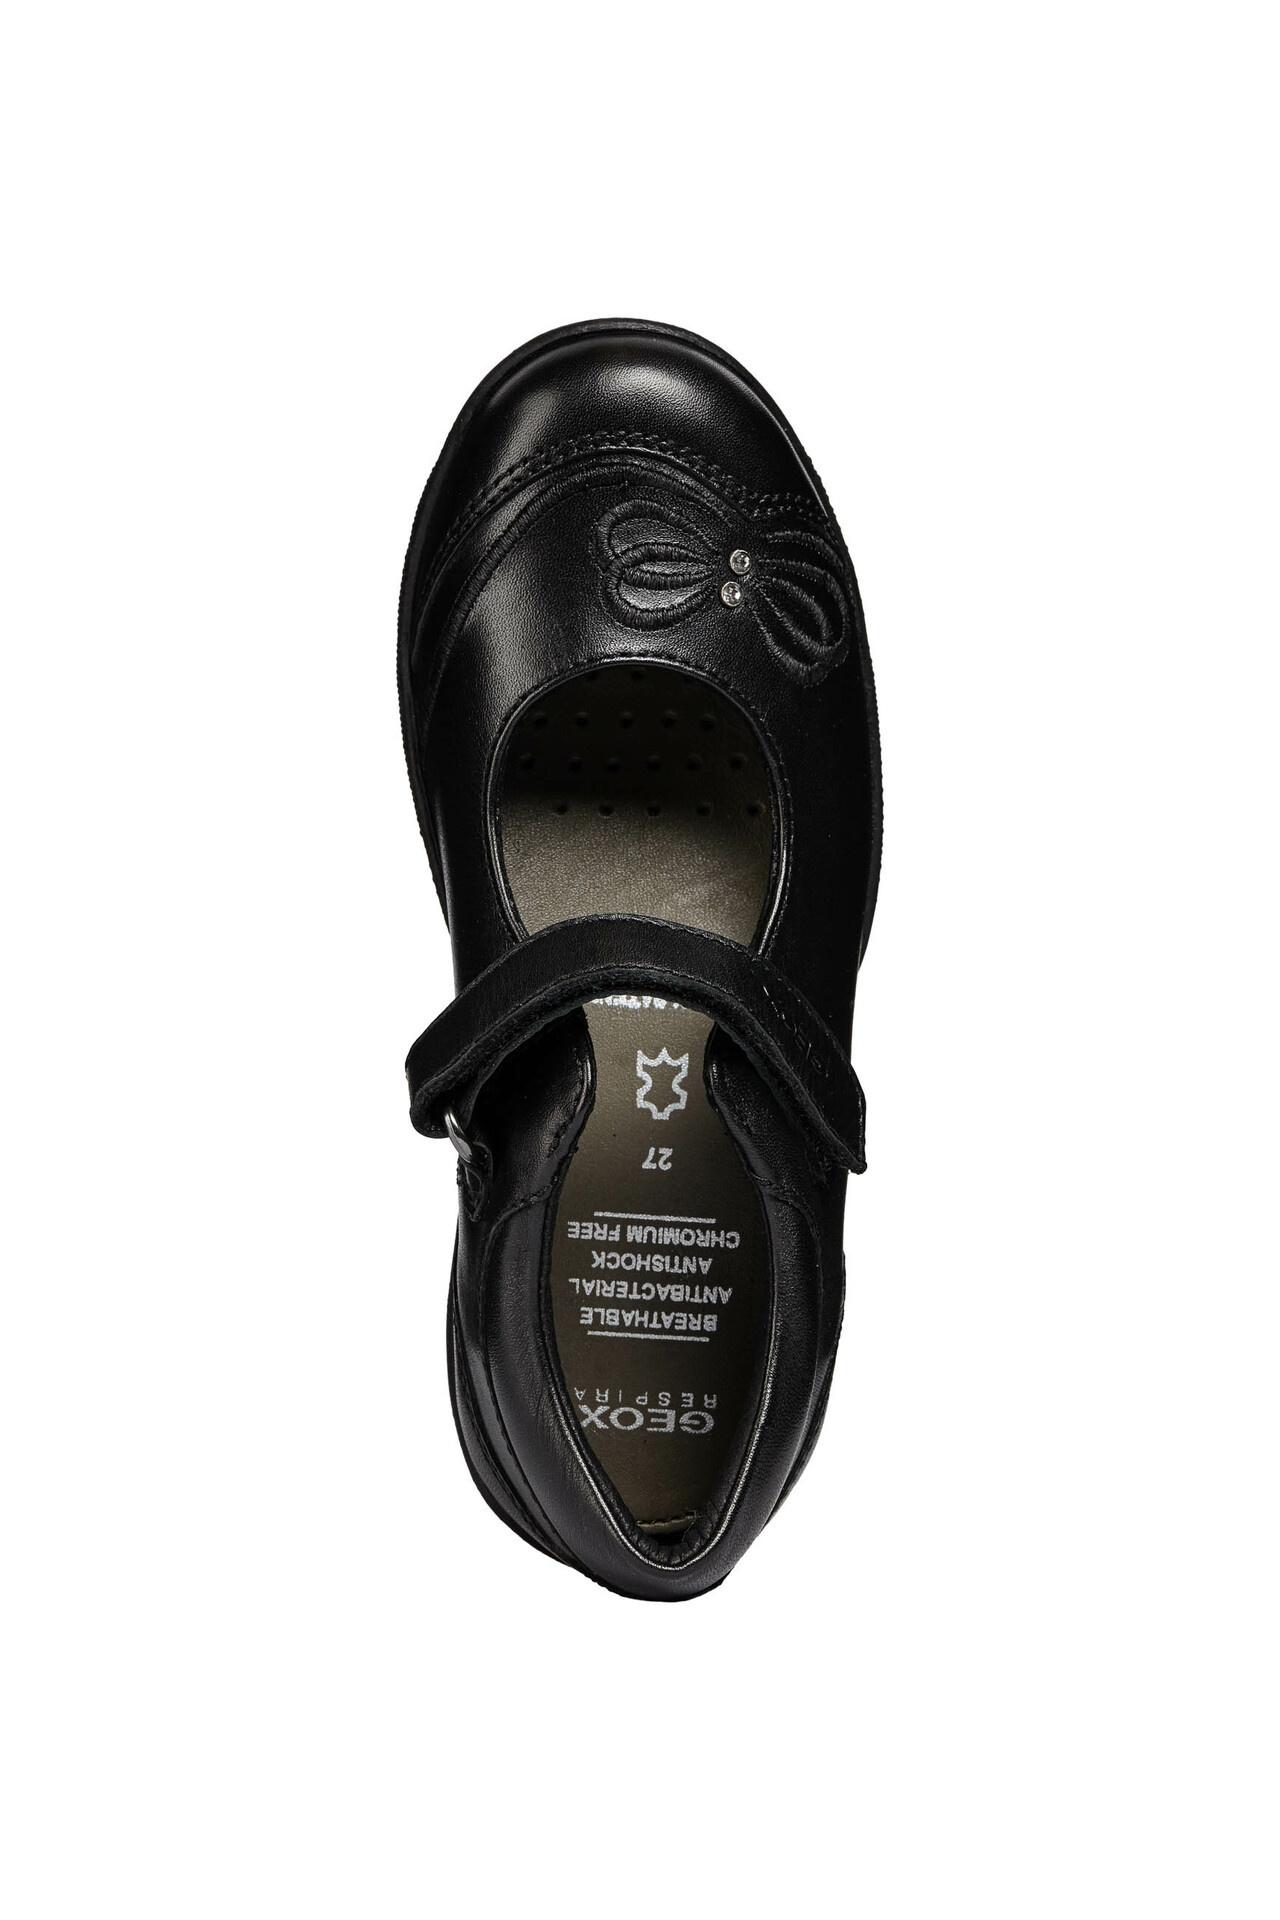 Geox Shadow Leather (new)